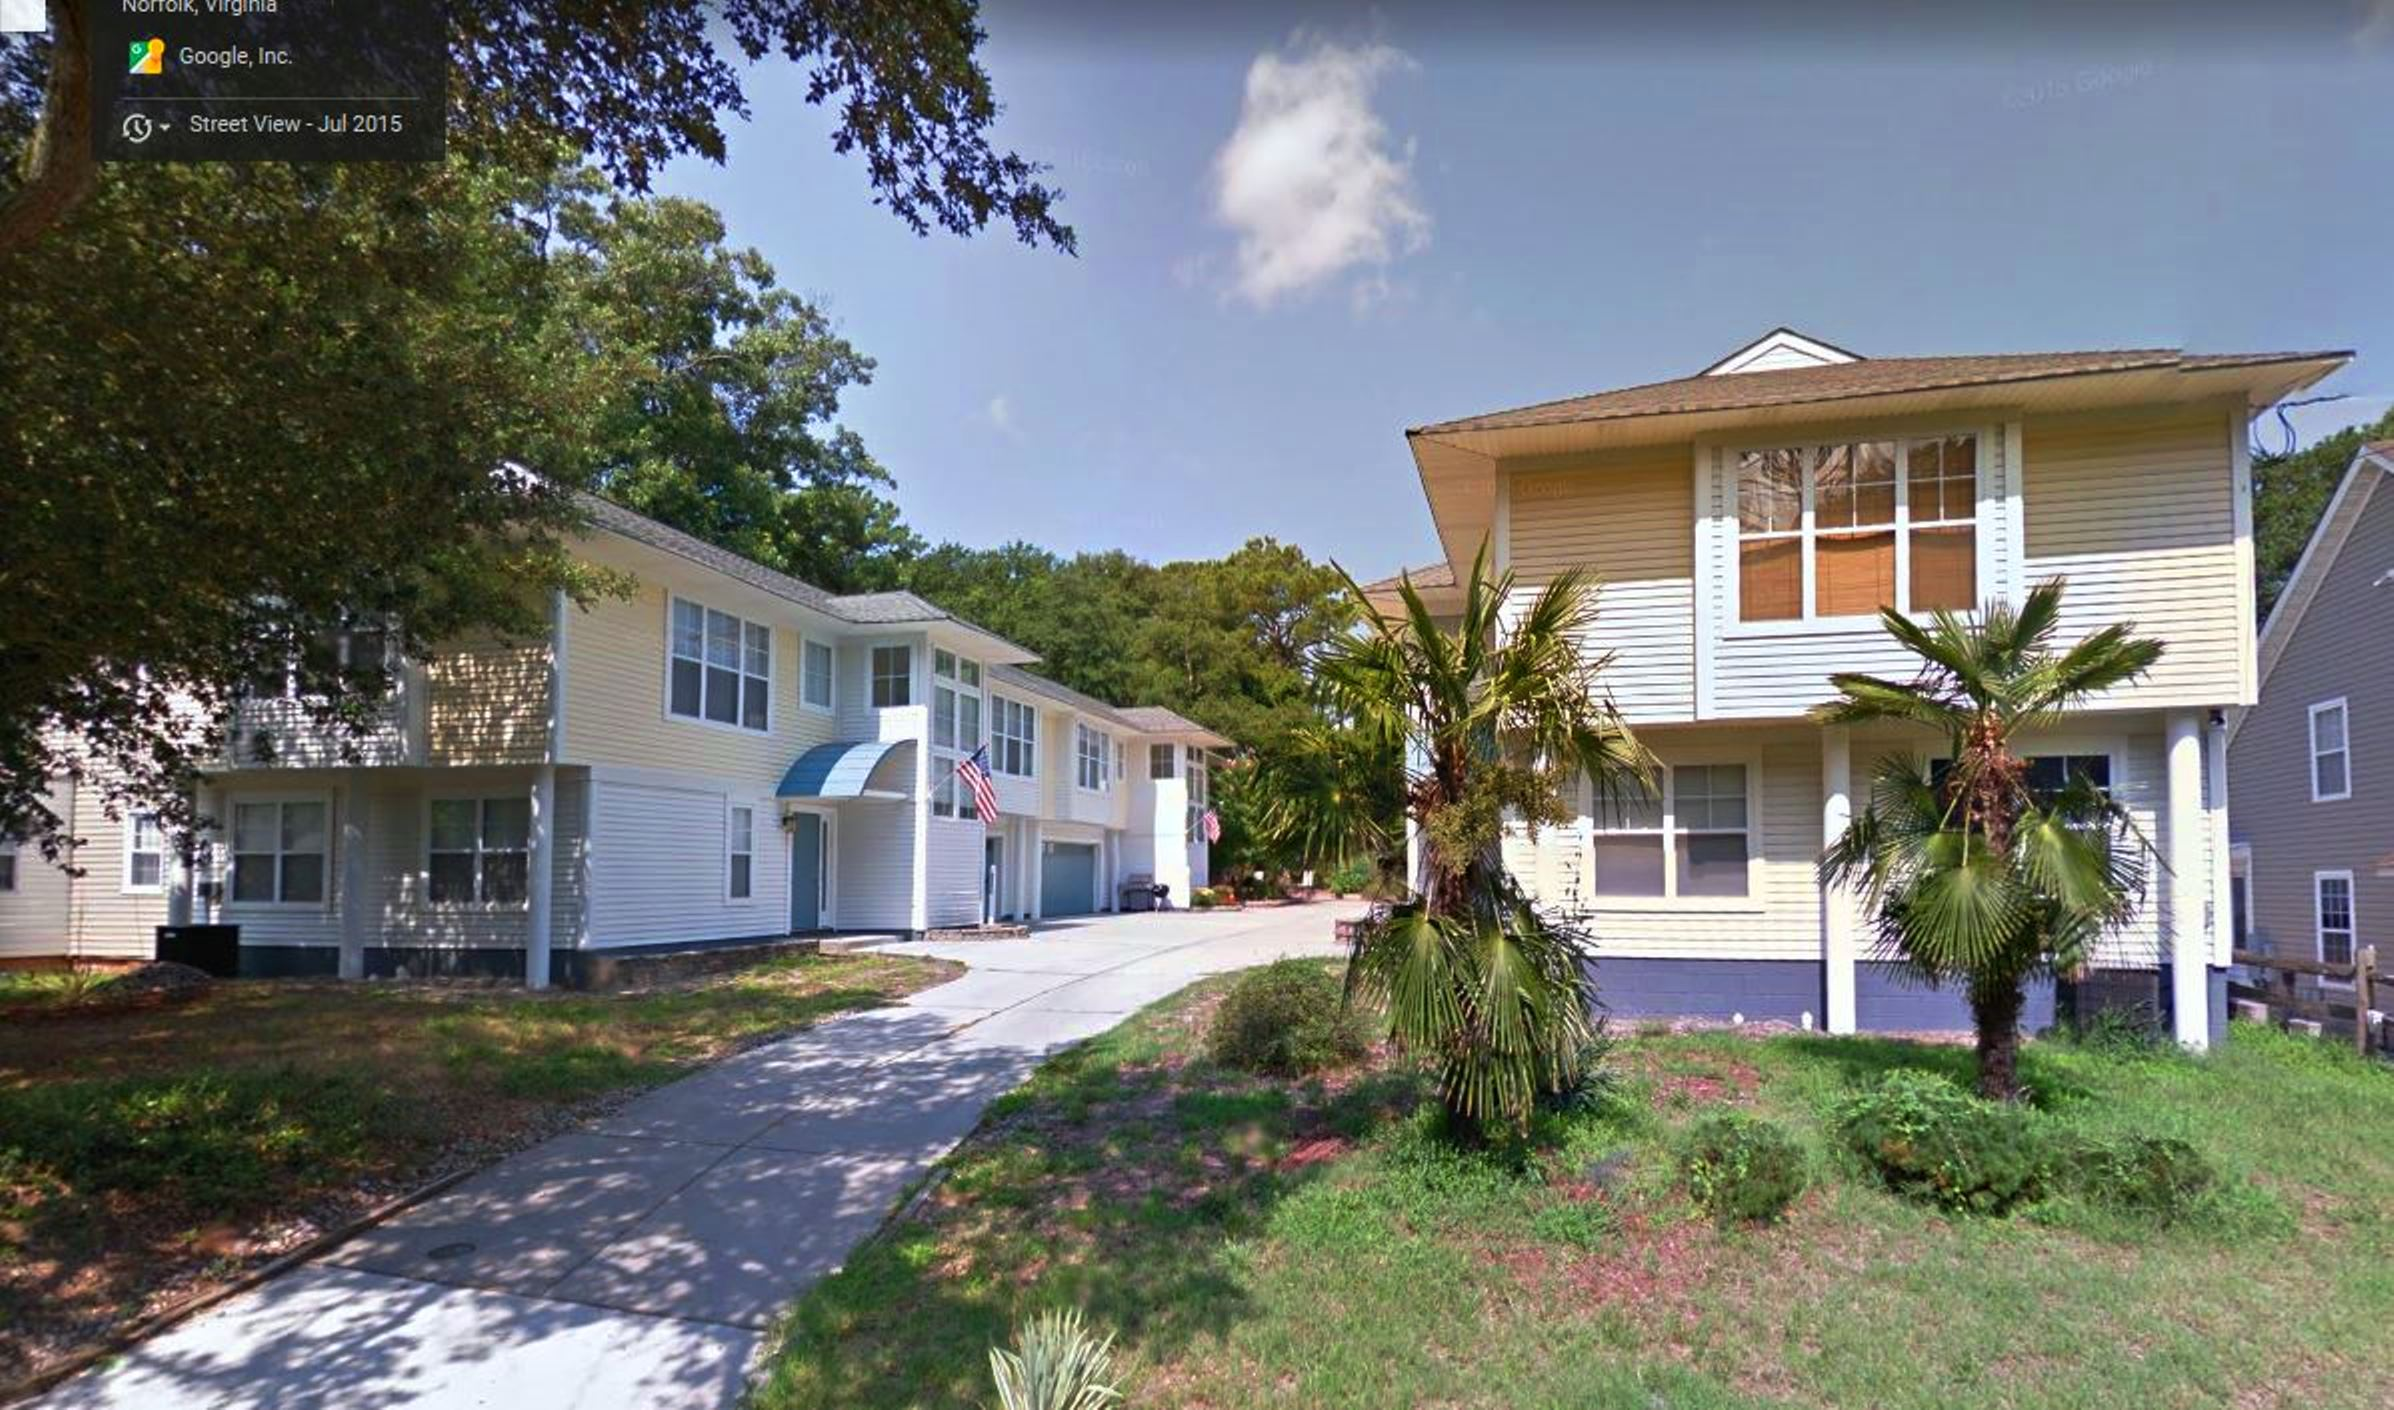 OV Lifestyle Duplexes #residence#home#homebuilder#virginiabeach#architect#architecture#vacation#VirginiaBeach#duplex#sanctuary#interiordesign